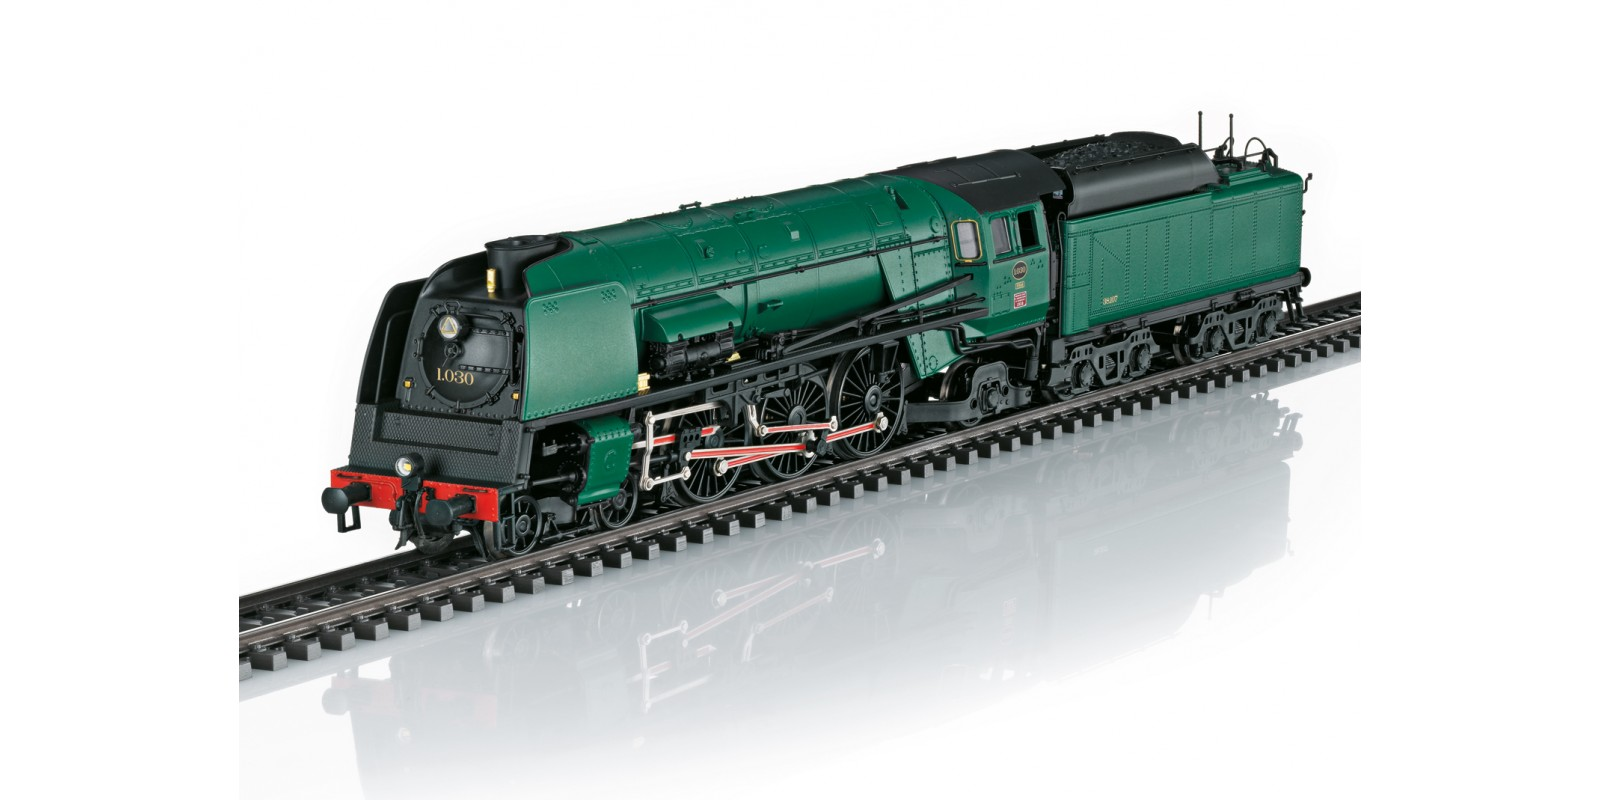 T25480 Dampflokomotive Reihe 1, SNCB, Ep. III